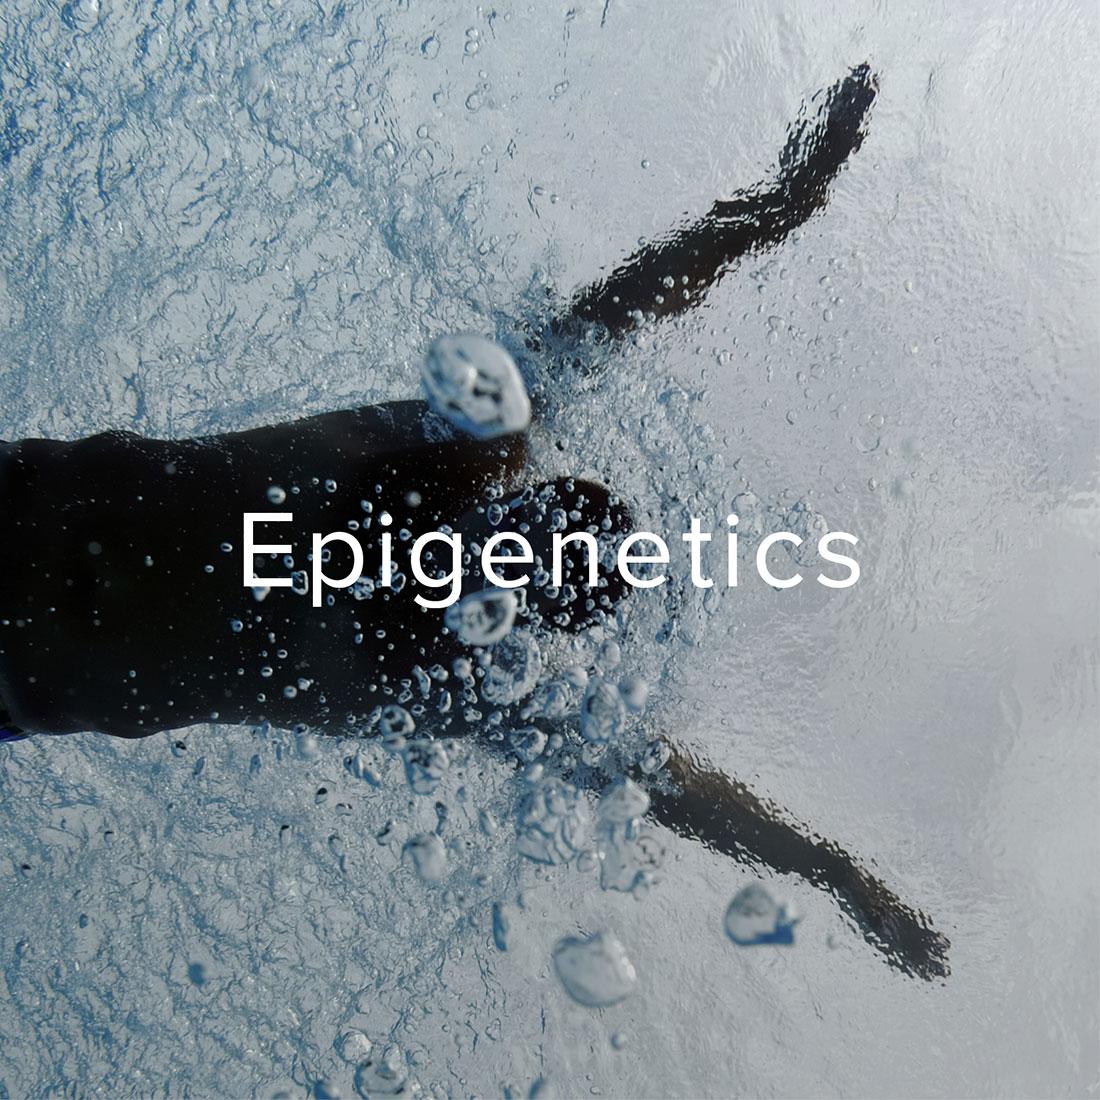 holos_life_sciences_biomarkers_epigenetics.jpg